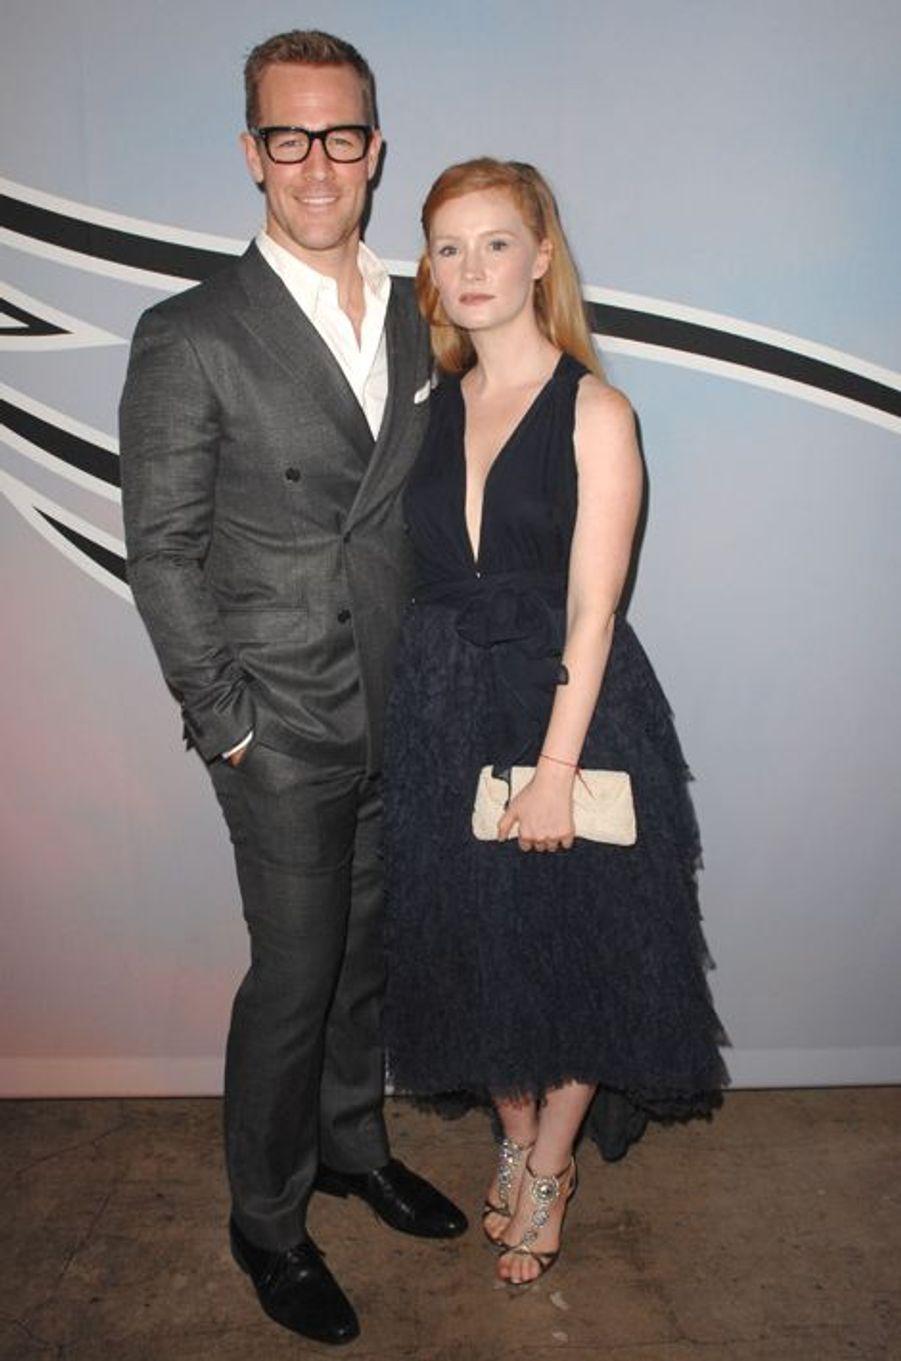 James Van Der Beek et Kimberly Brook à Los Angeles le 25 octobre 2014